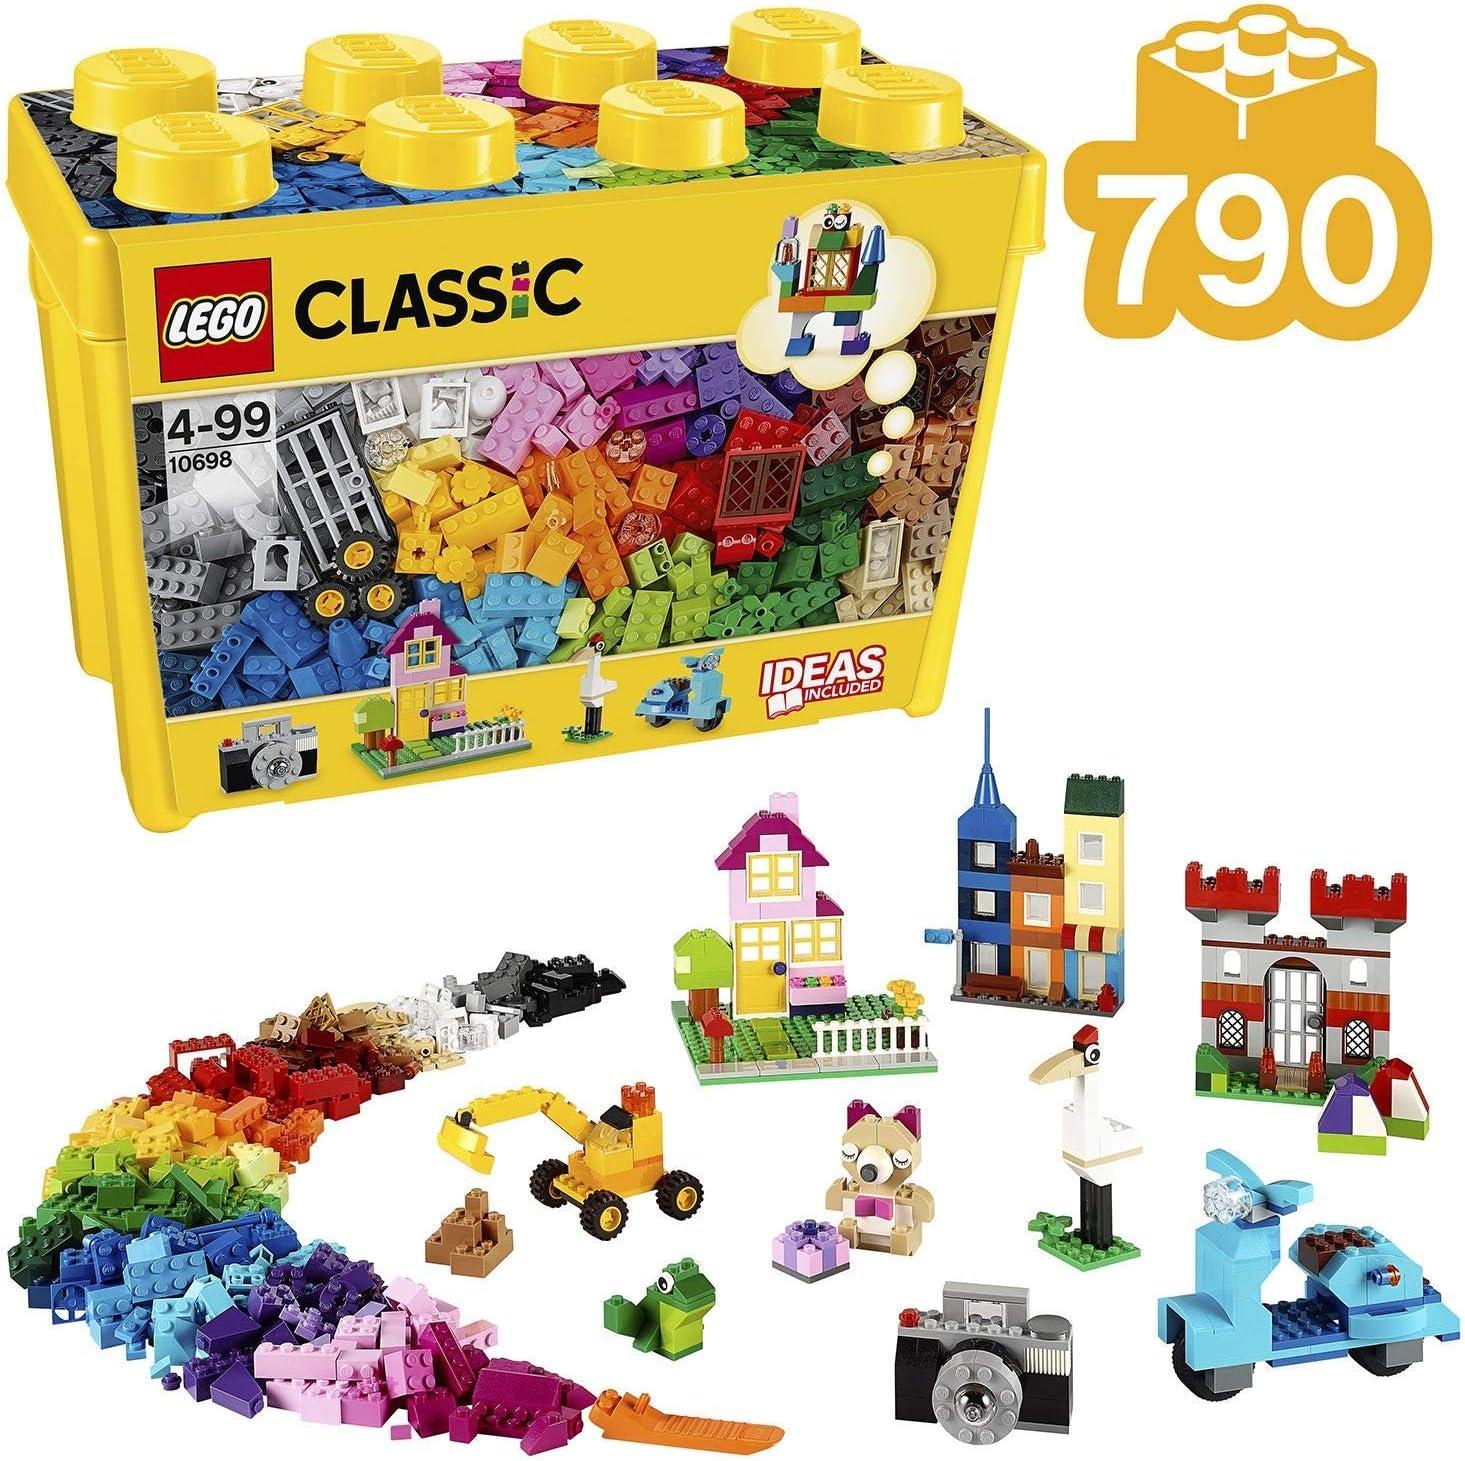 88 LEGO plaque 2x8 jaune 5 pièces